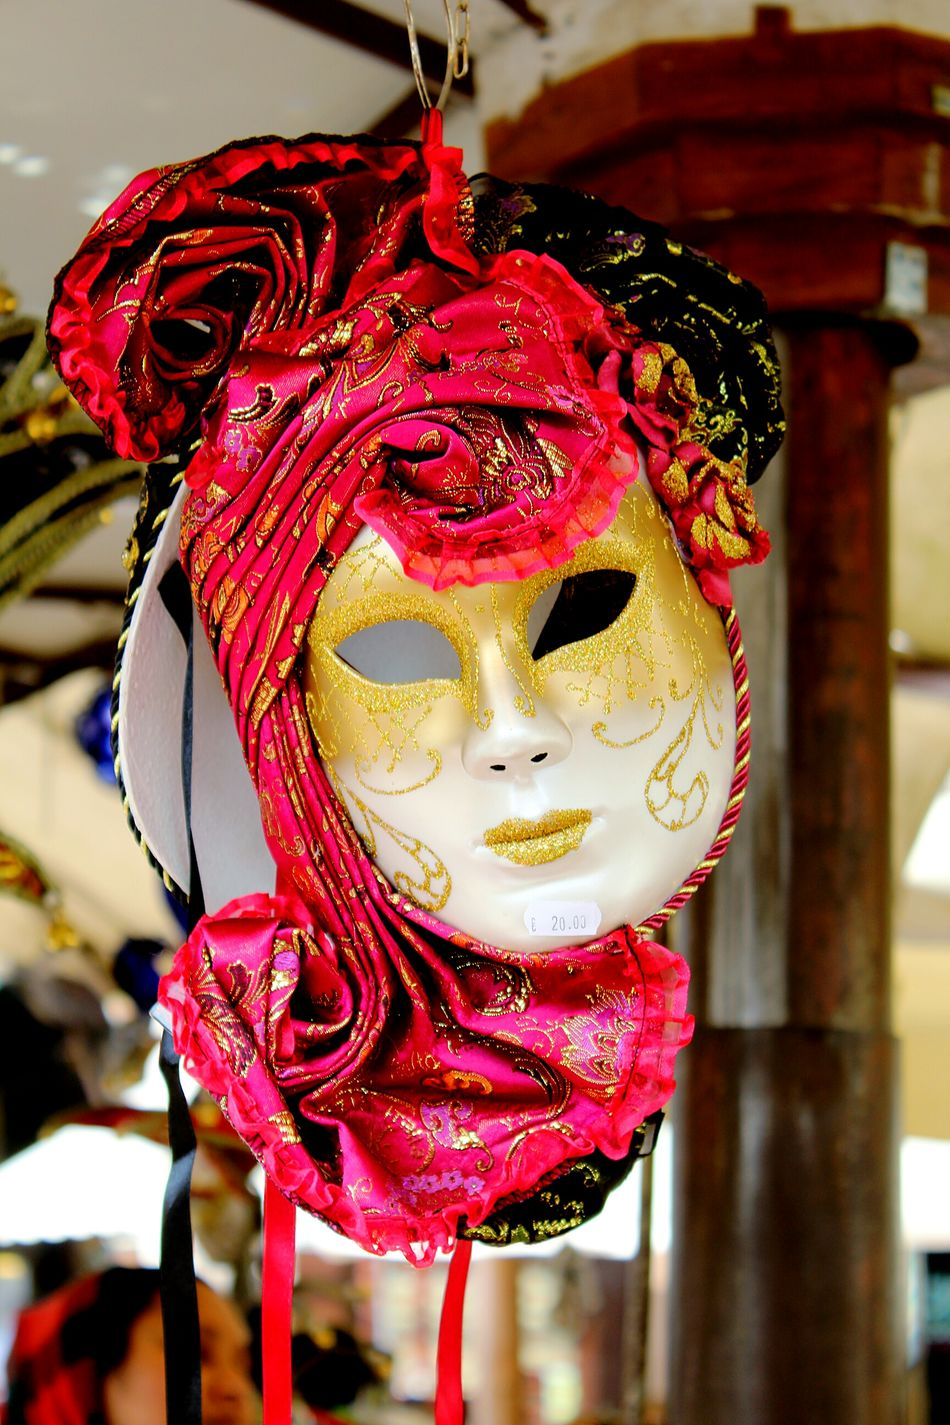 Mask Carneval Carnevale Di Venezia Venetian Mask Venice, Italy Venice Arts Culture And Entertainment Culture Italy Colourful Colorful Bright Bright Colors Art Is Everywhere